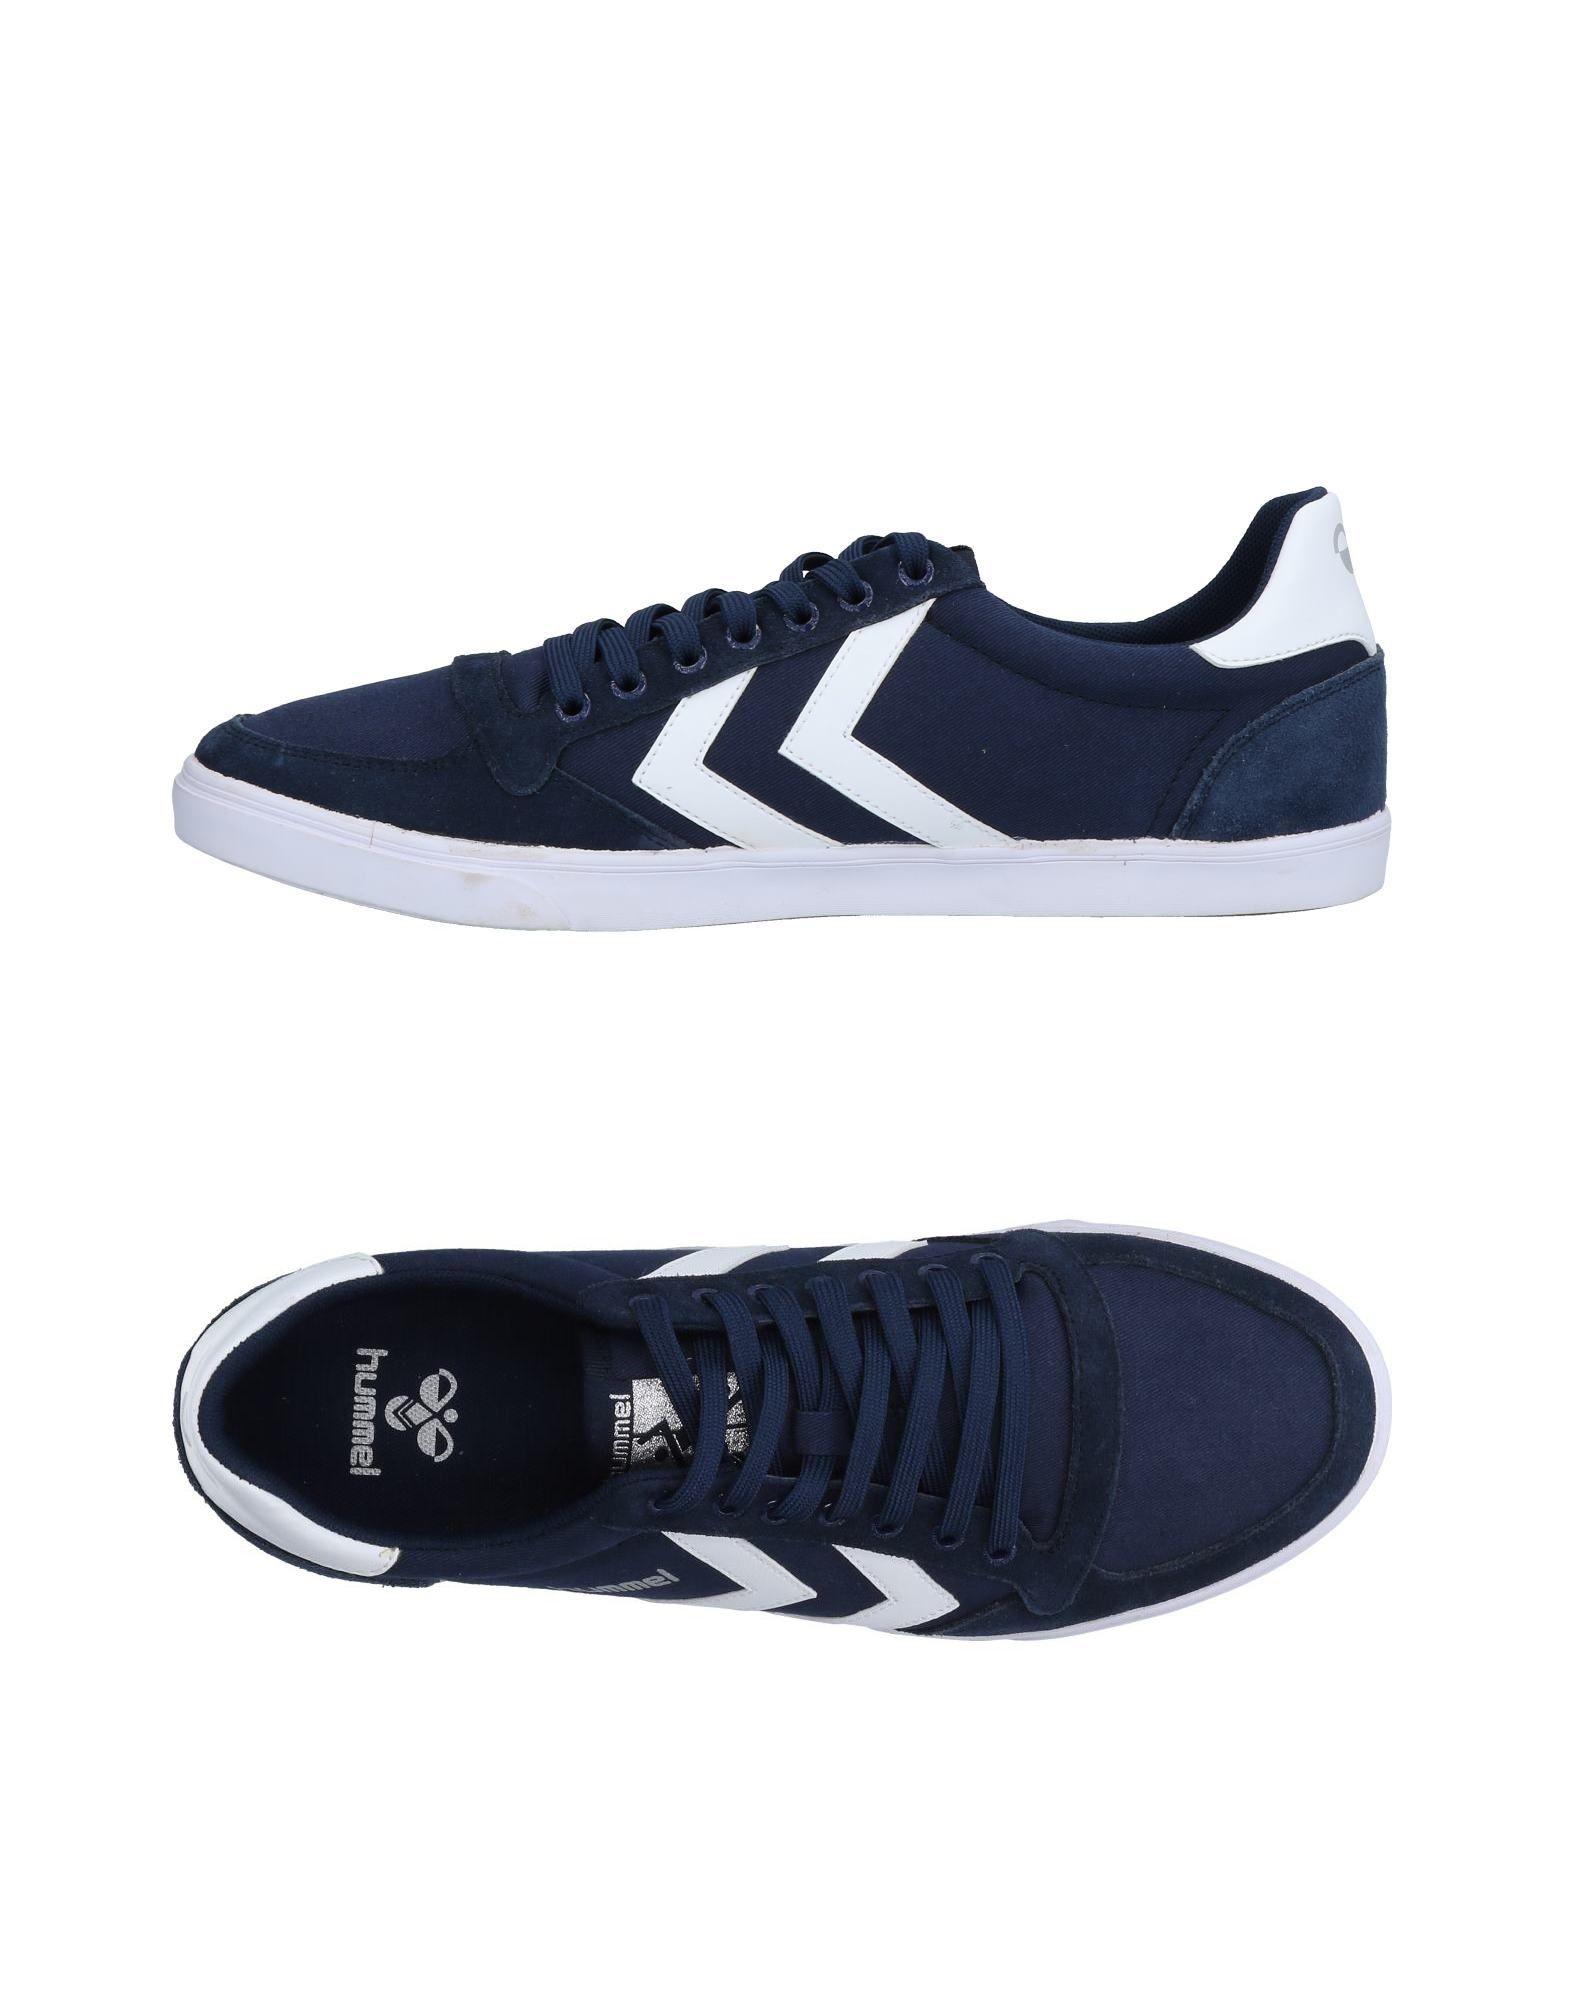 Moda Uomo Sneakers Hummel Uomo Moda - 11520589BI 16d393